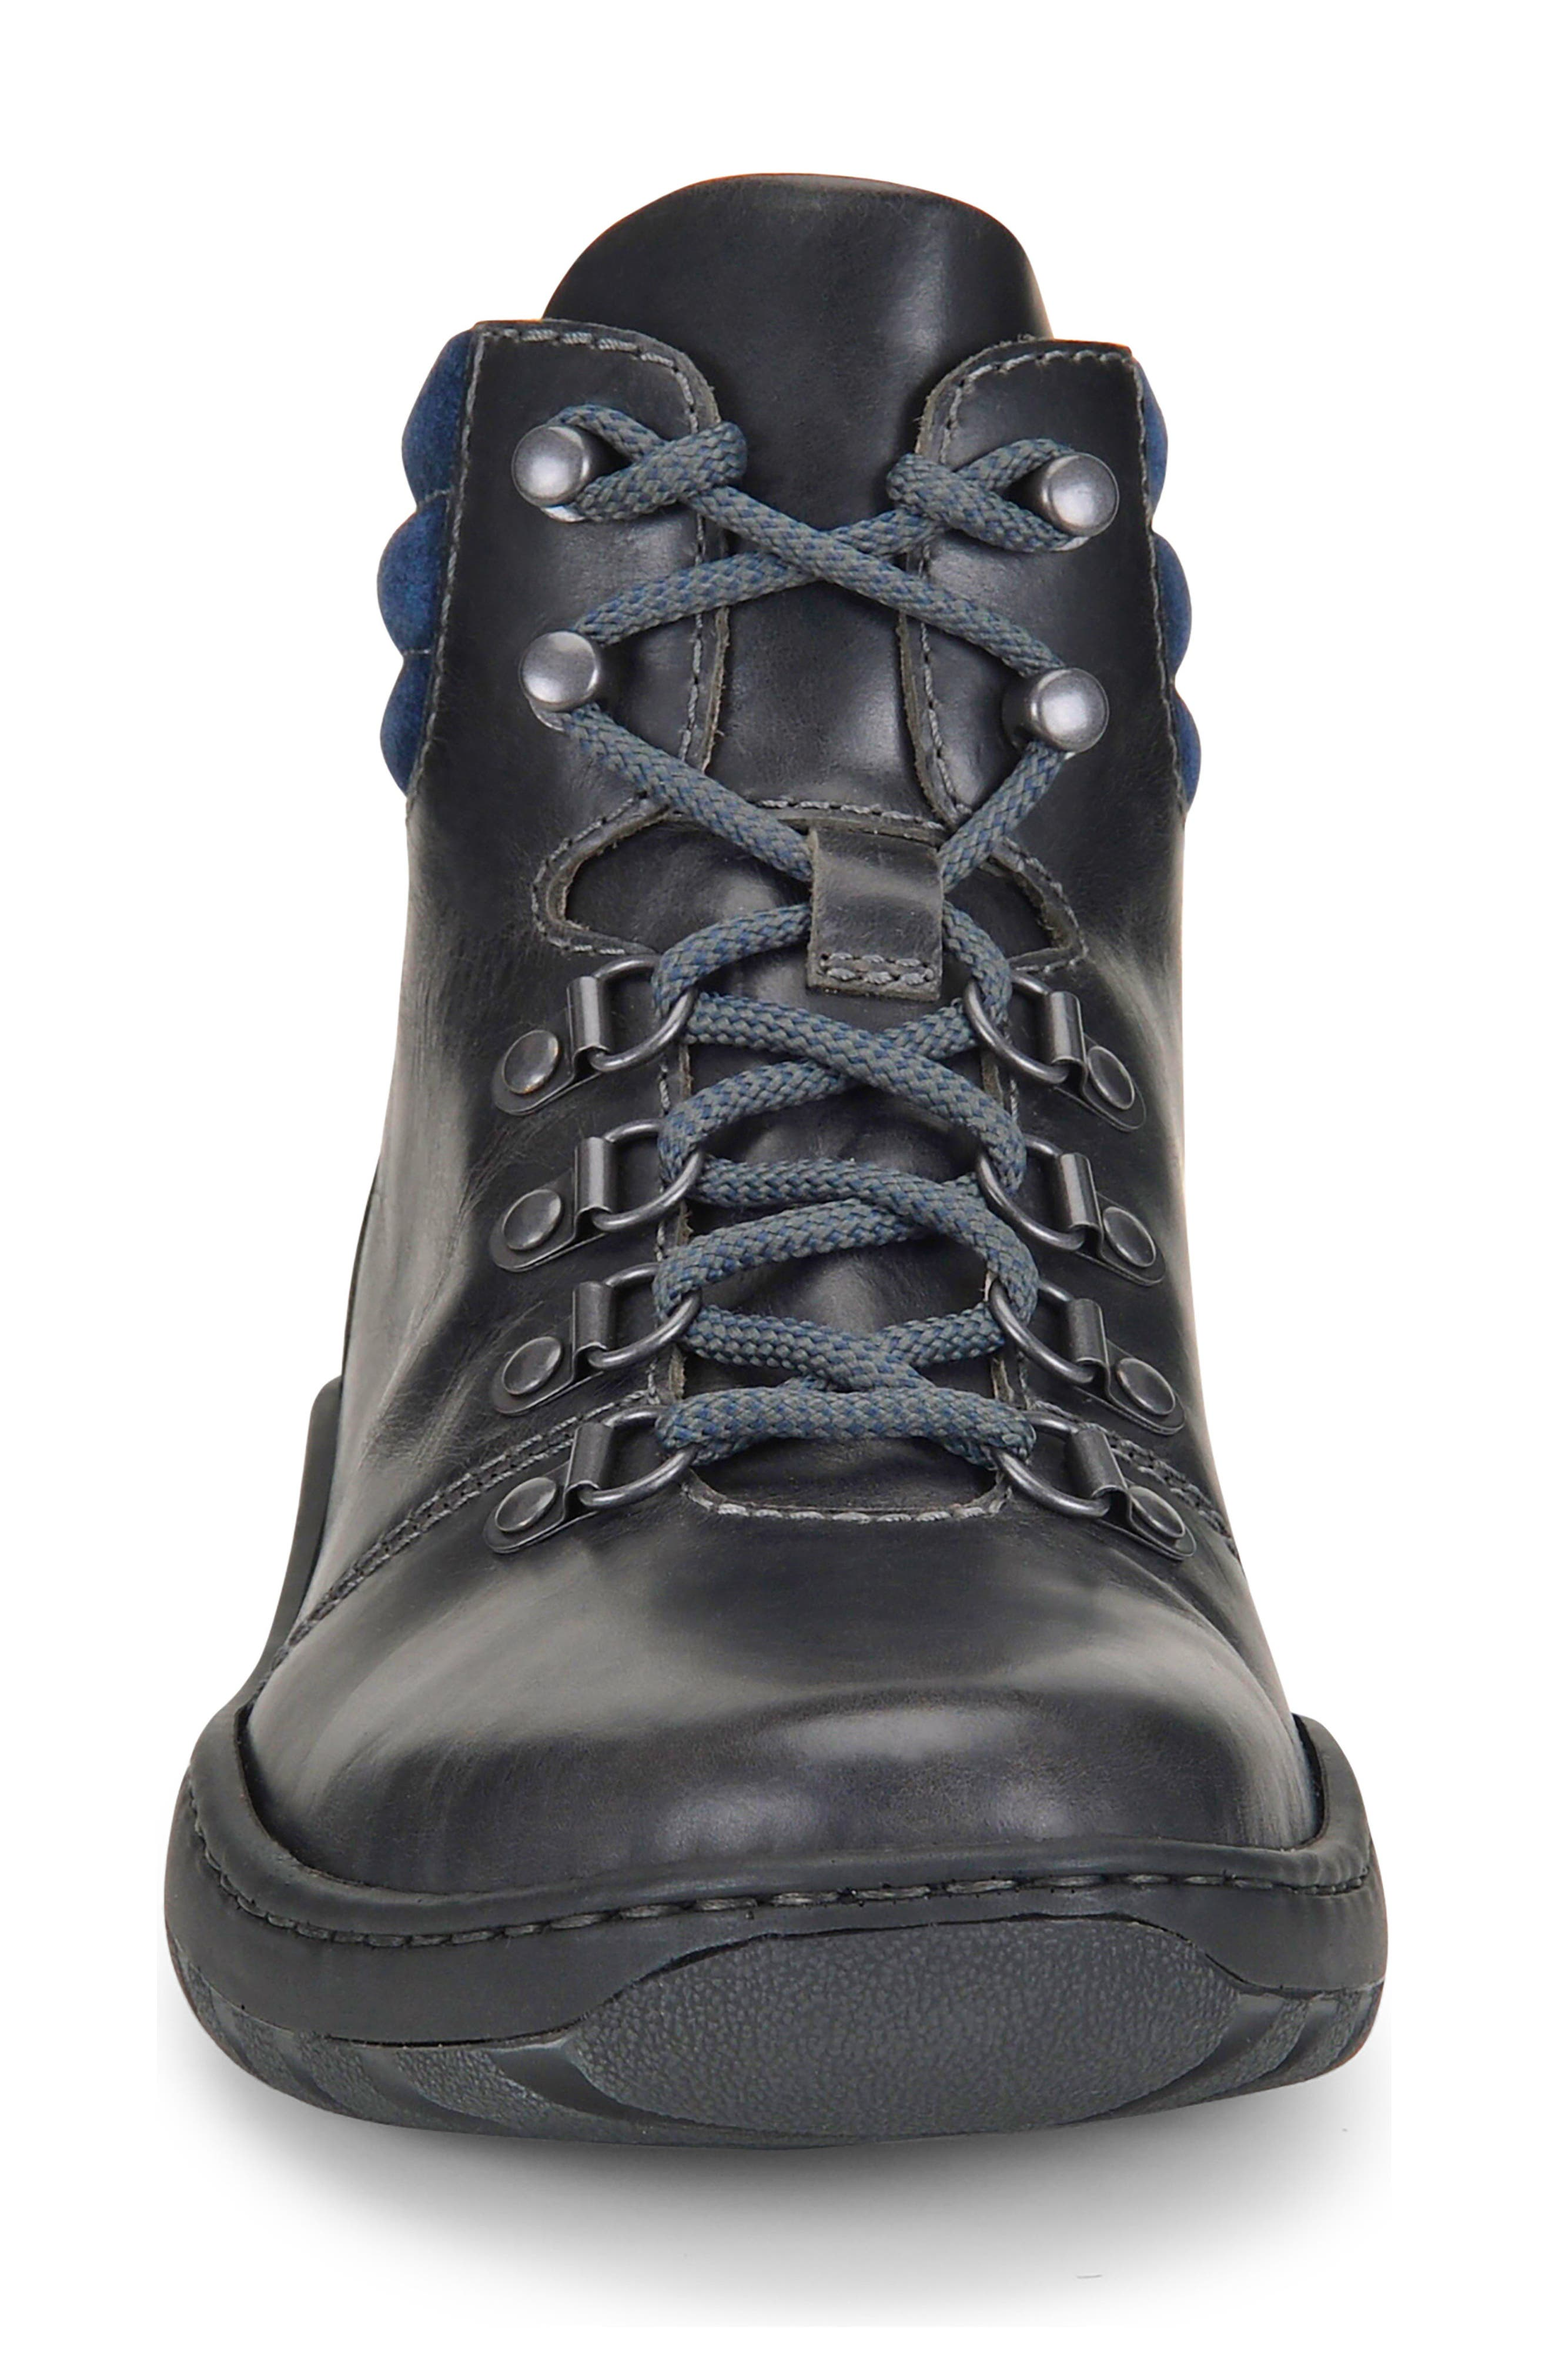 Dutchman Plain Toe Boot,                             Alternate thumbnail 4, color,                             DARK GREY/ BLUE